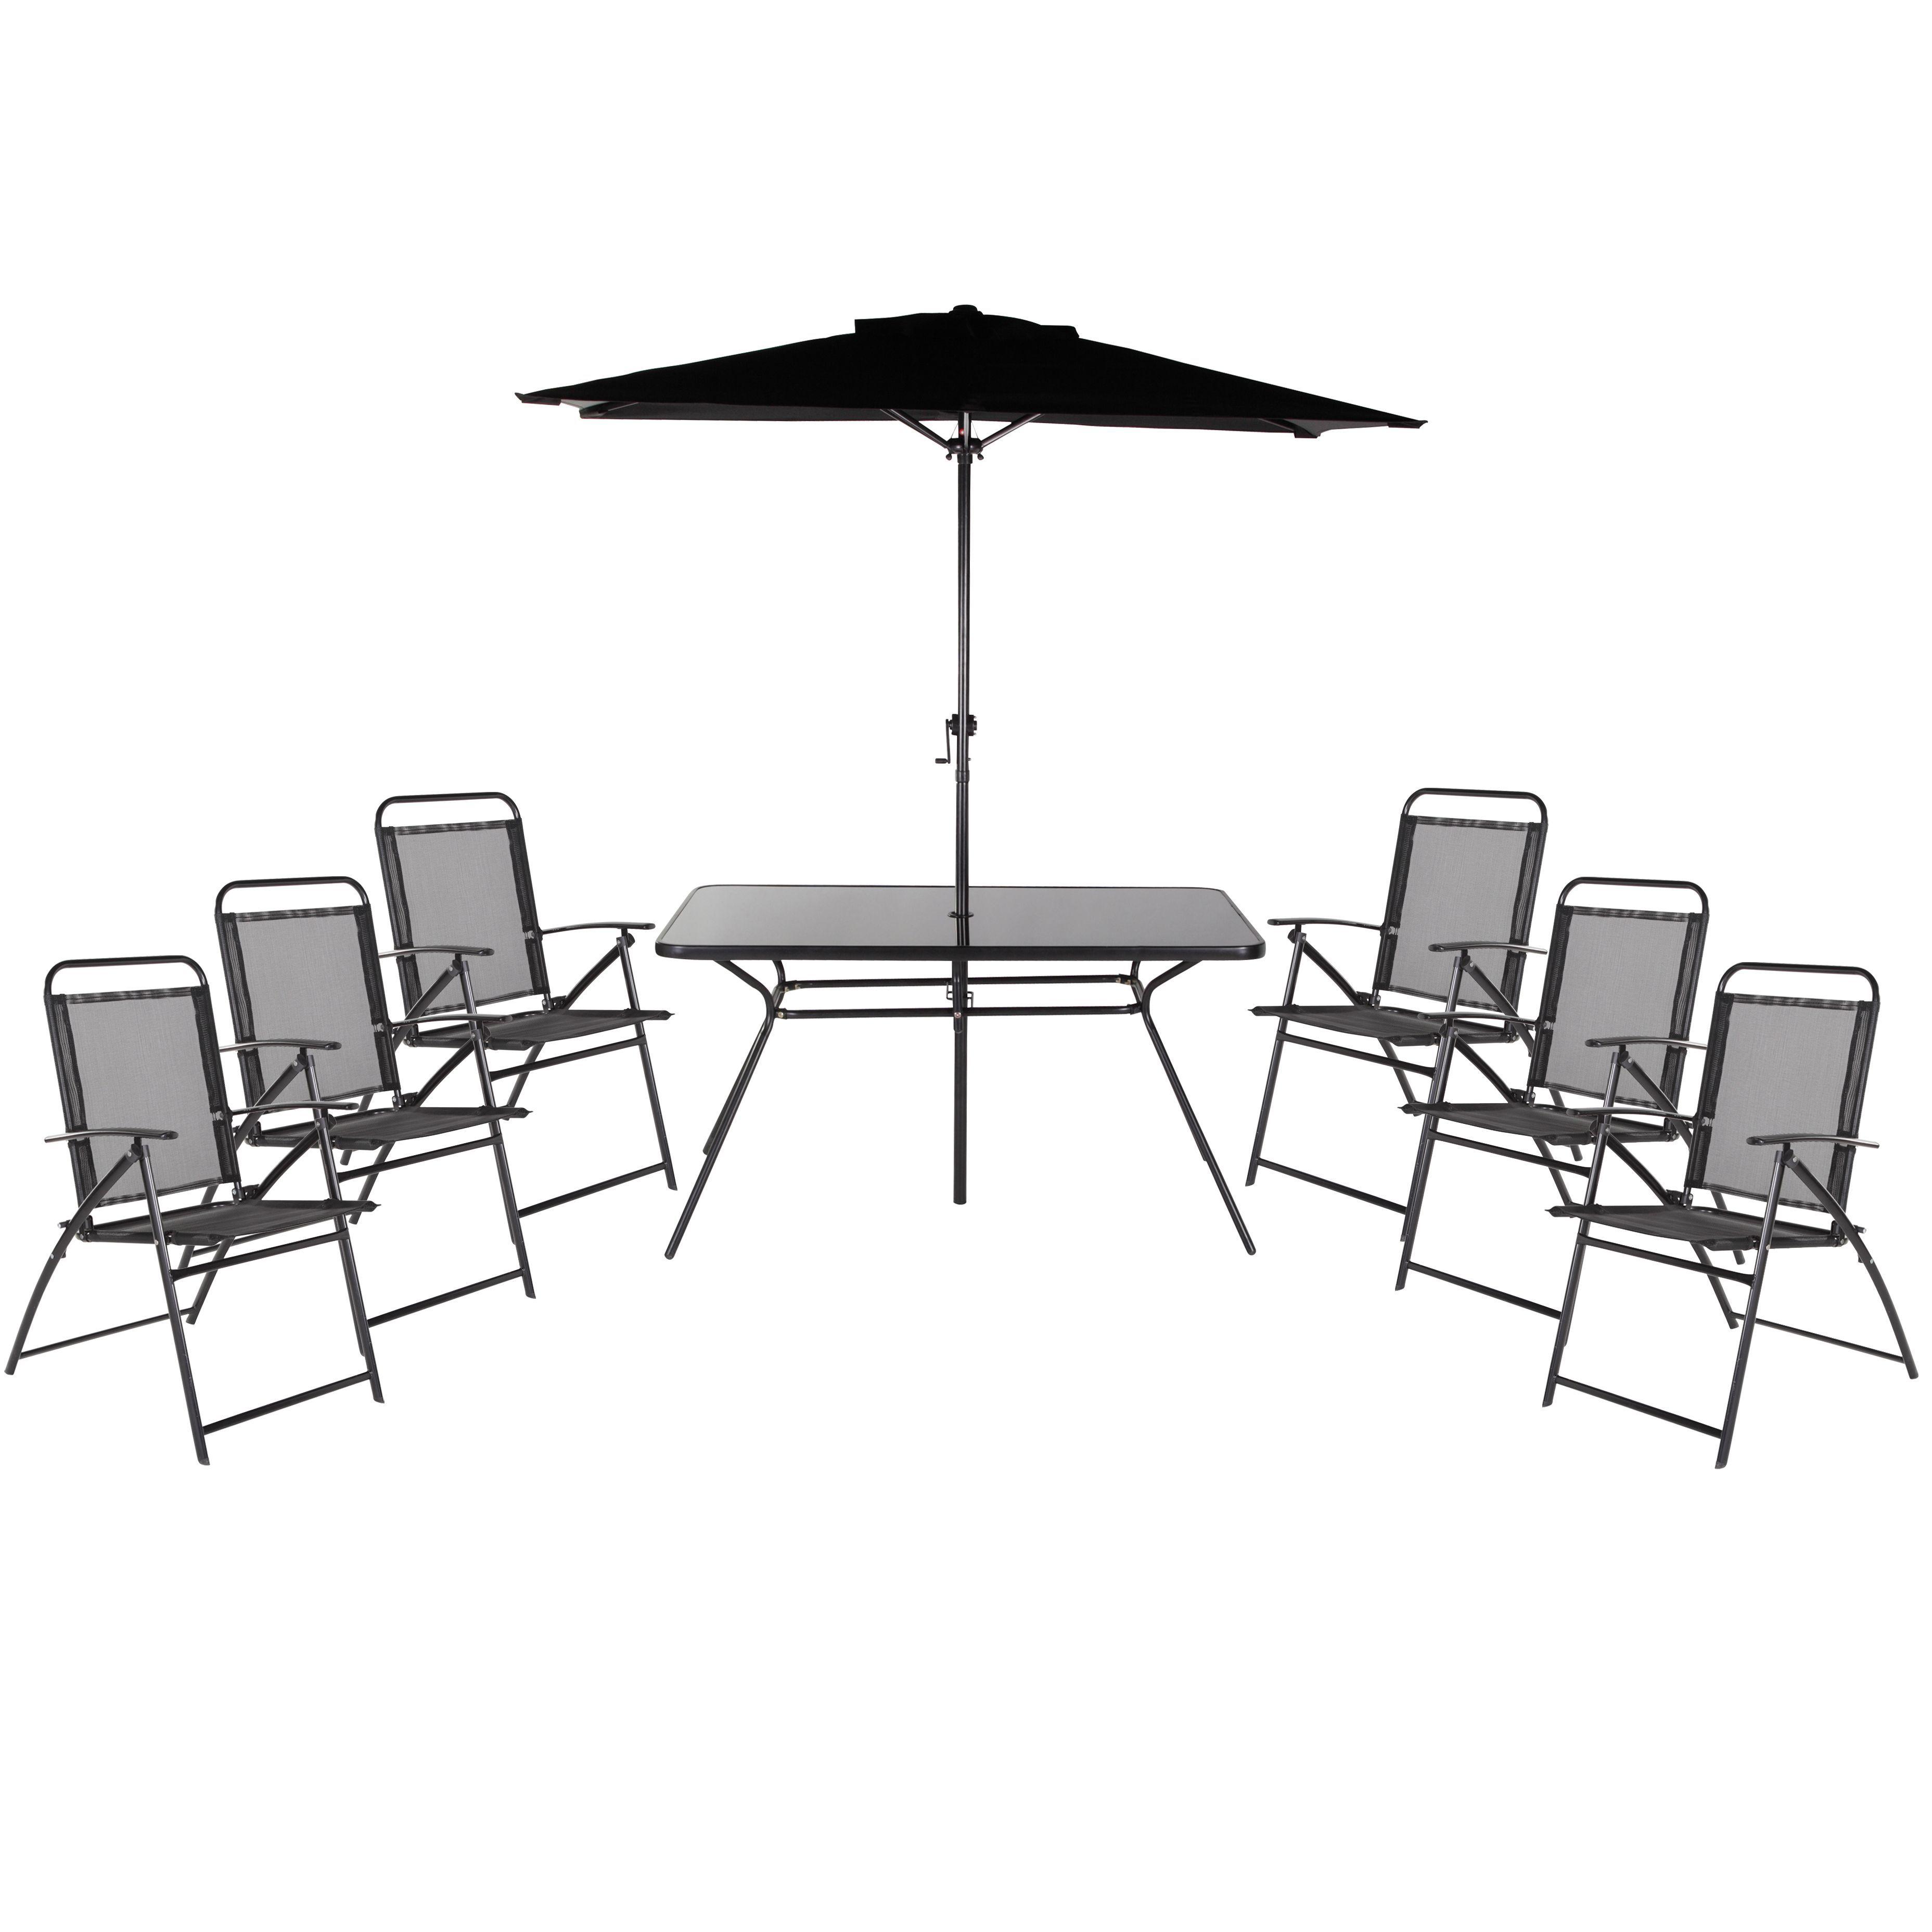 6 Seater Metal Garden Furniture Garden table and 2 chairs b q rattan garden furniture home design bahama metal 6 seater dining set parasol departments diy at b q workwithnaturefo